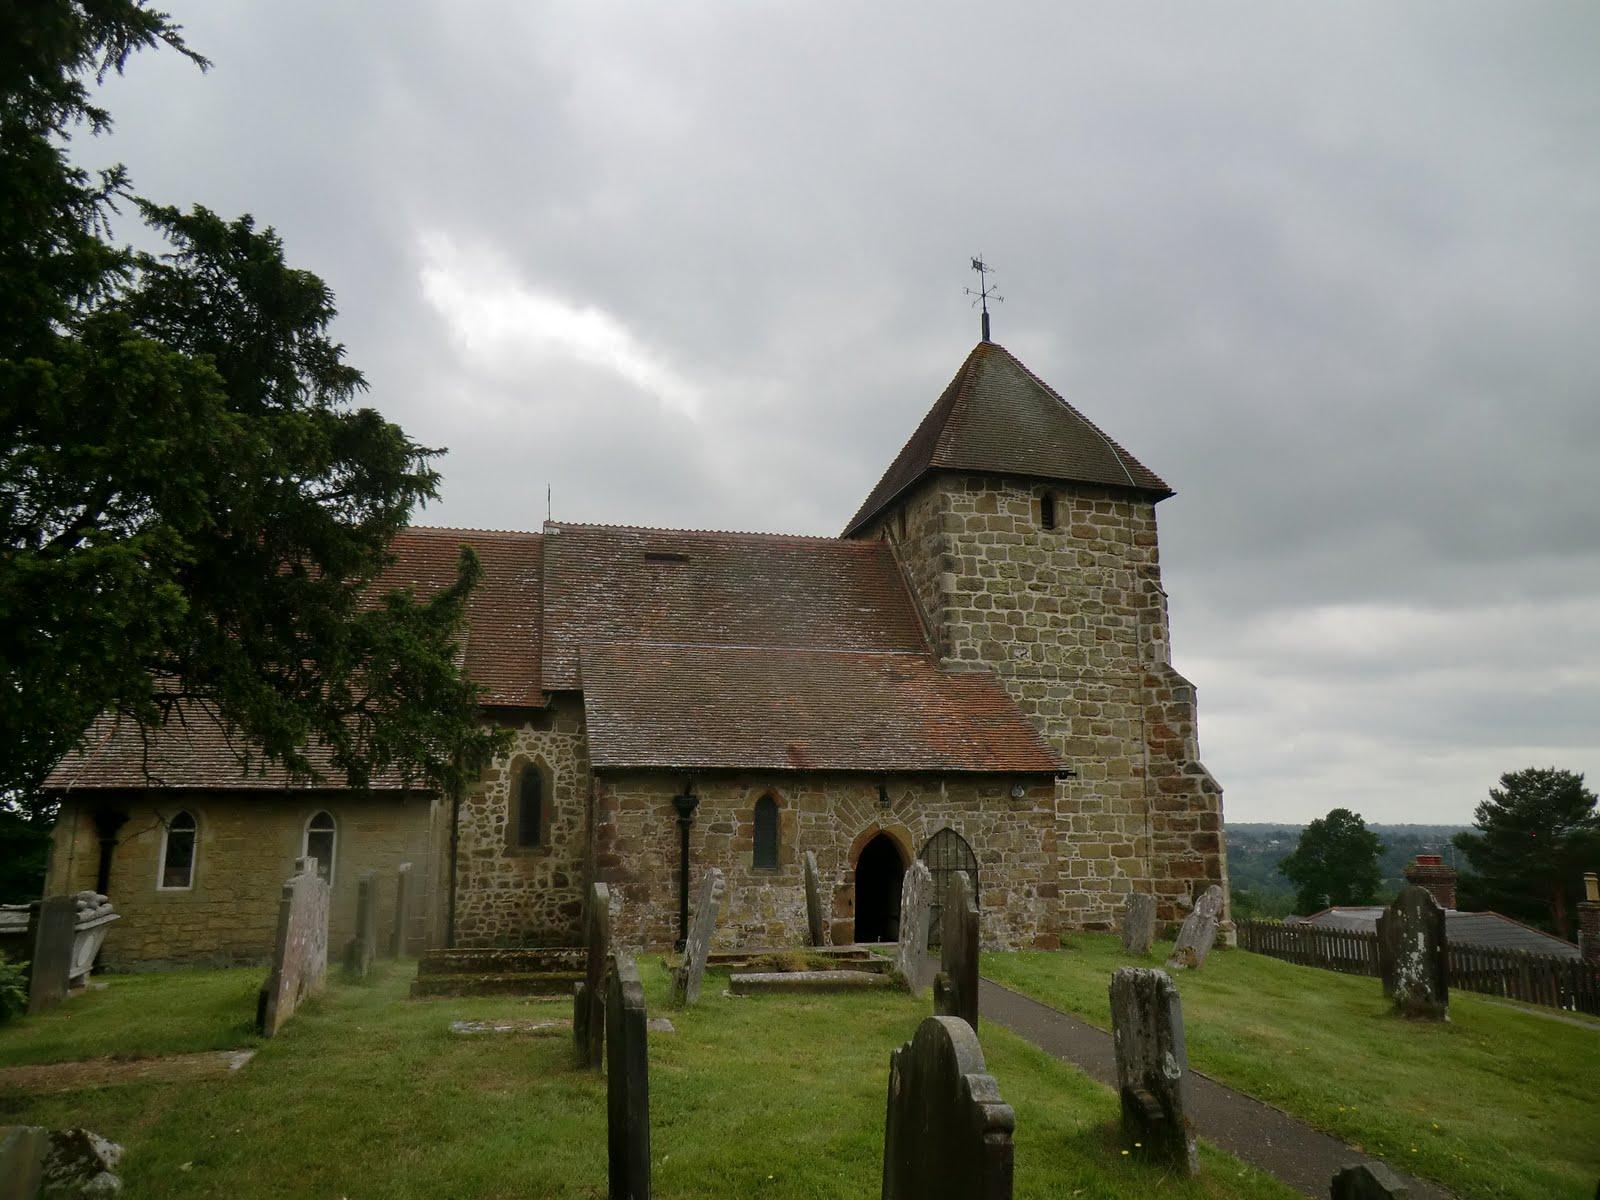 CIMG8590 St Lawrence's church, Bidborough